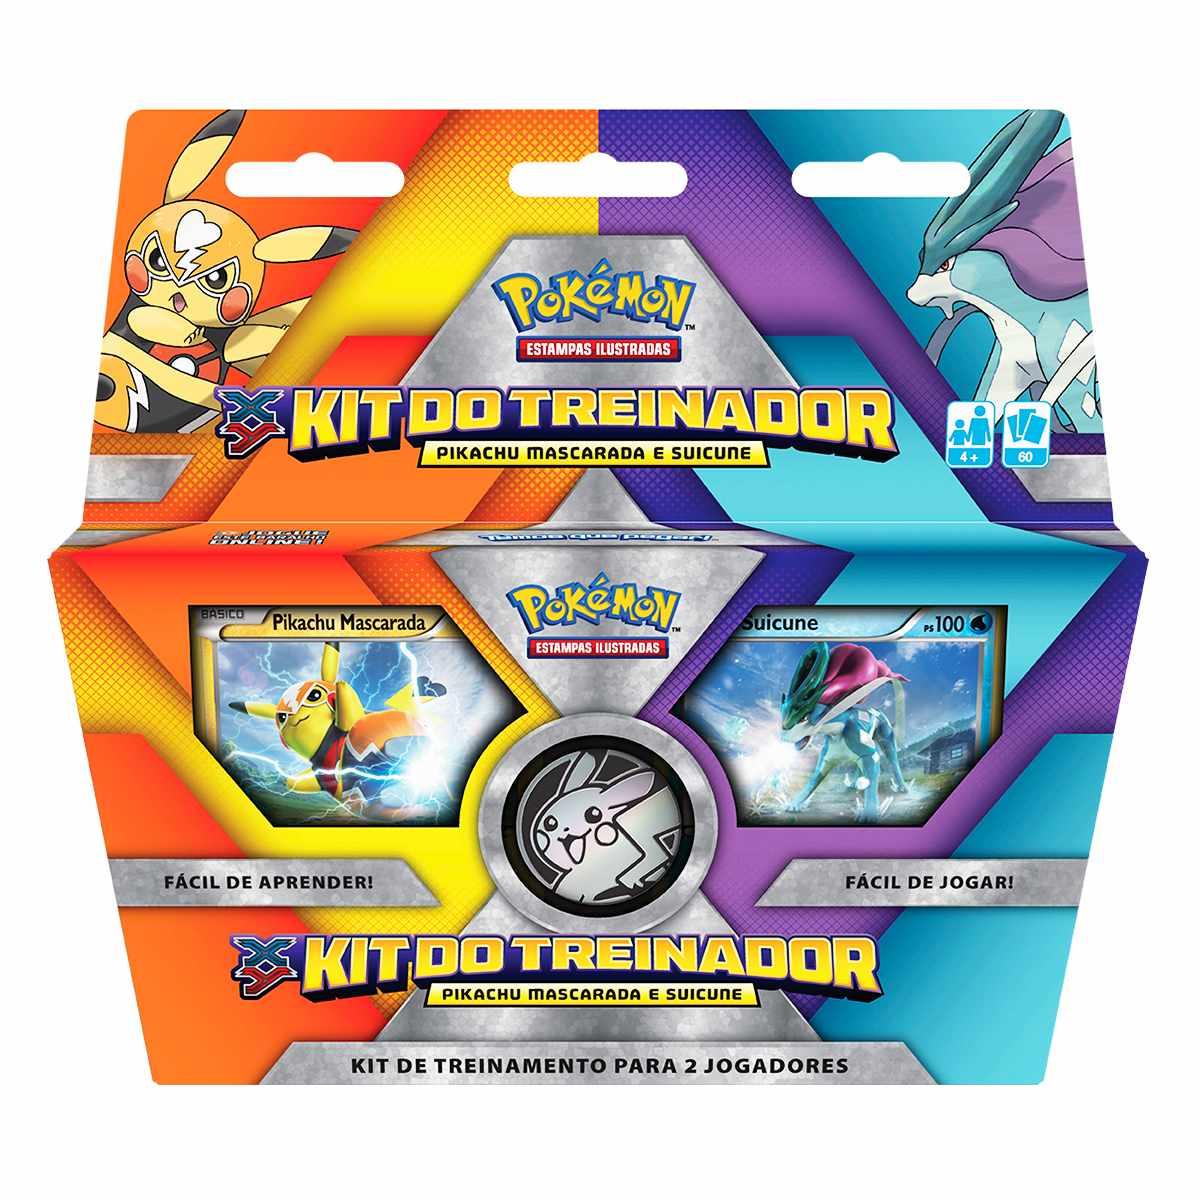 Pokémon Kit Treinador Pikachu Mascarada e Suicune